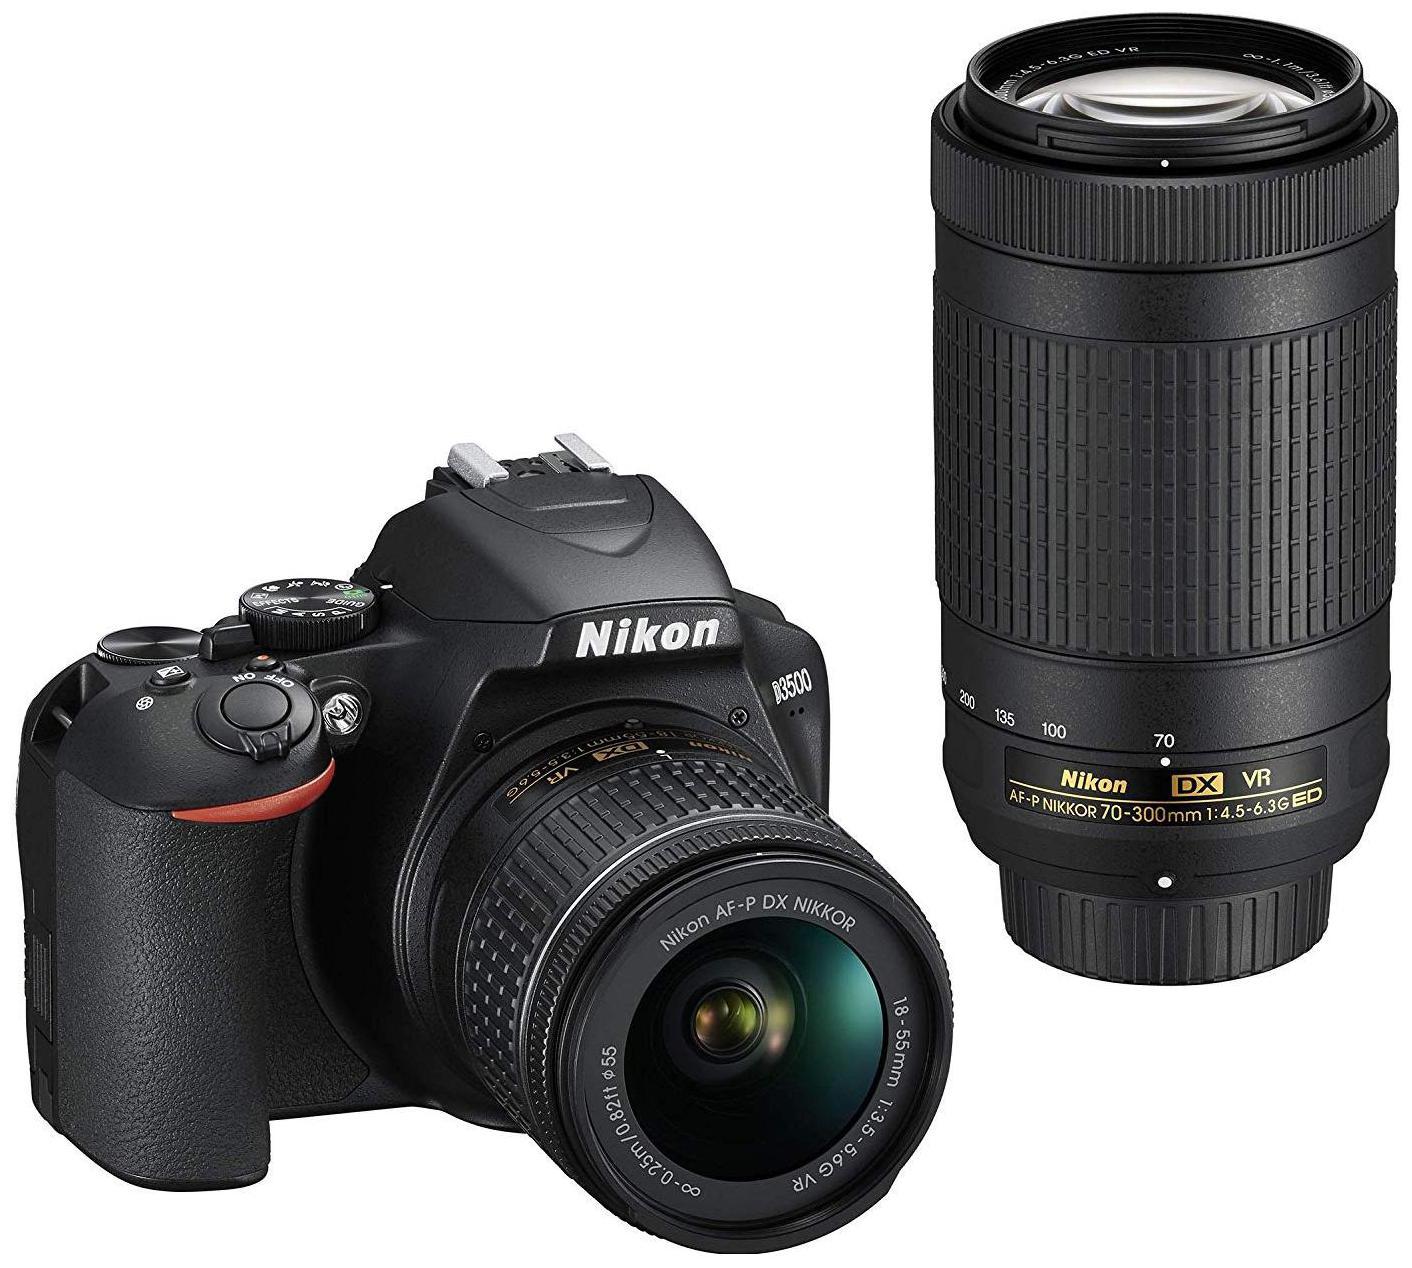 Nikon D3500 Kit (AF-P DX Nikkor 18-55mm f/3.5-5.6G VR & AF-P DX Nikkor 70-300mm f/4.5-6.3G ED) DSLR Camera (Black)